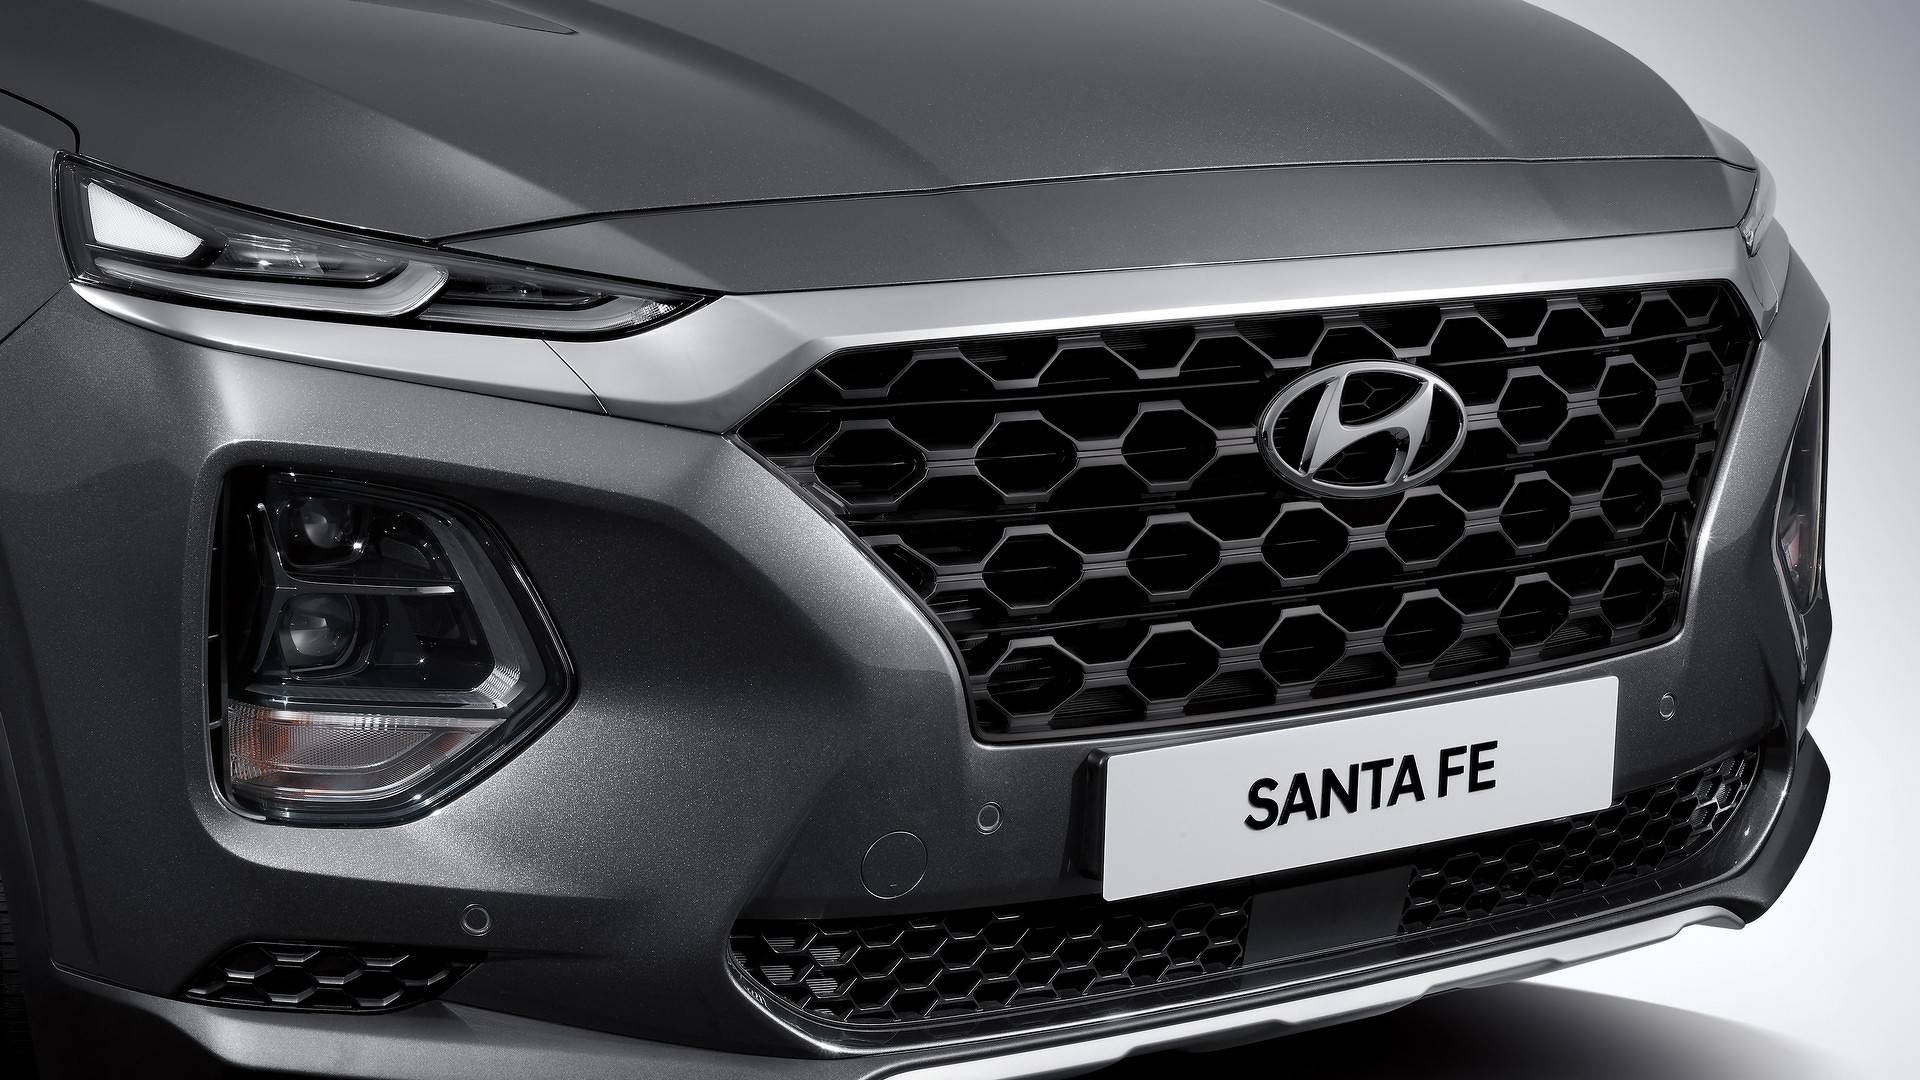 Hyundai Brings New Santa Fe, Refreshed Tucson, Electric Kona